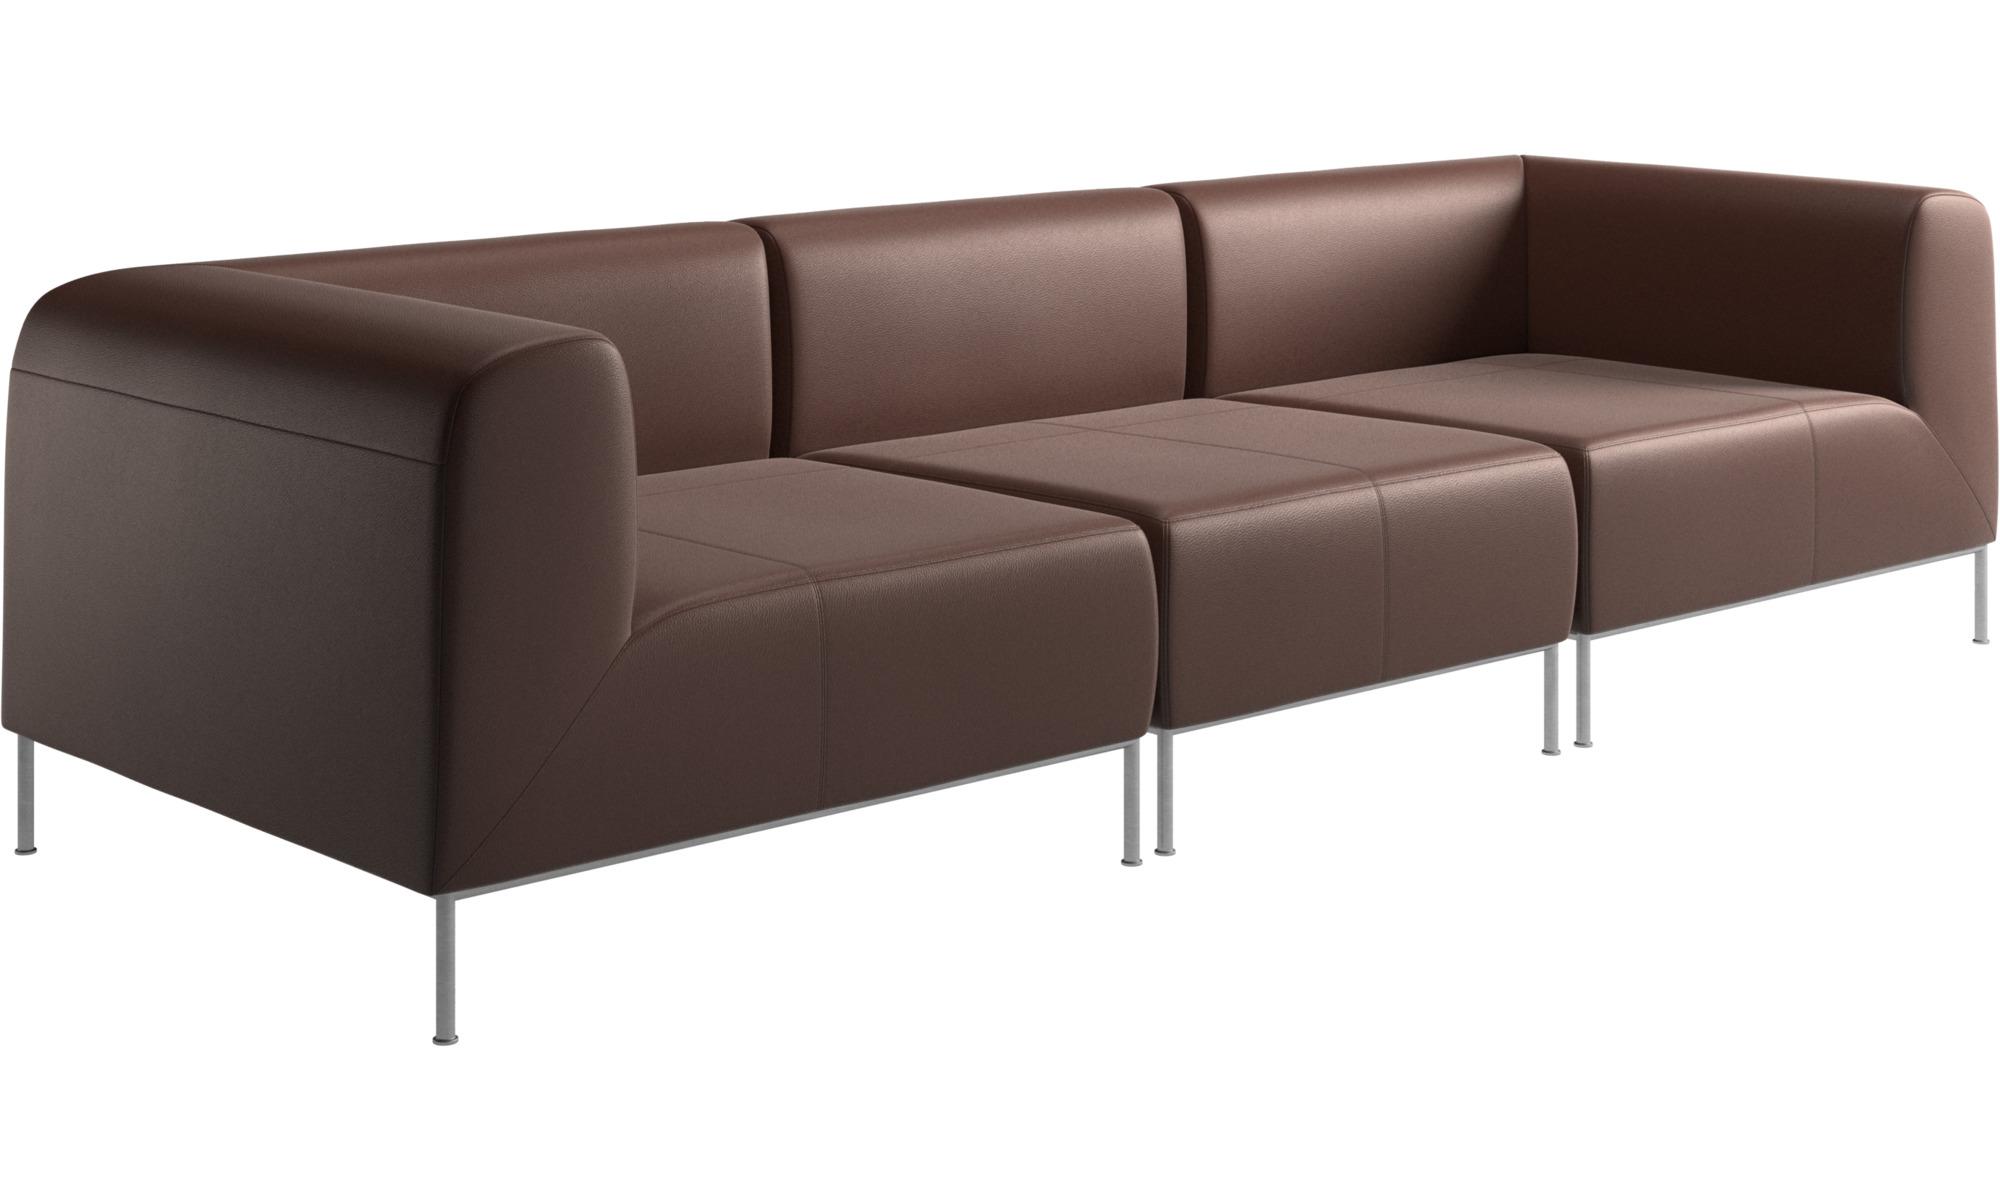 Modular Sofas Miami Sofa Boconcept